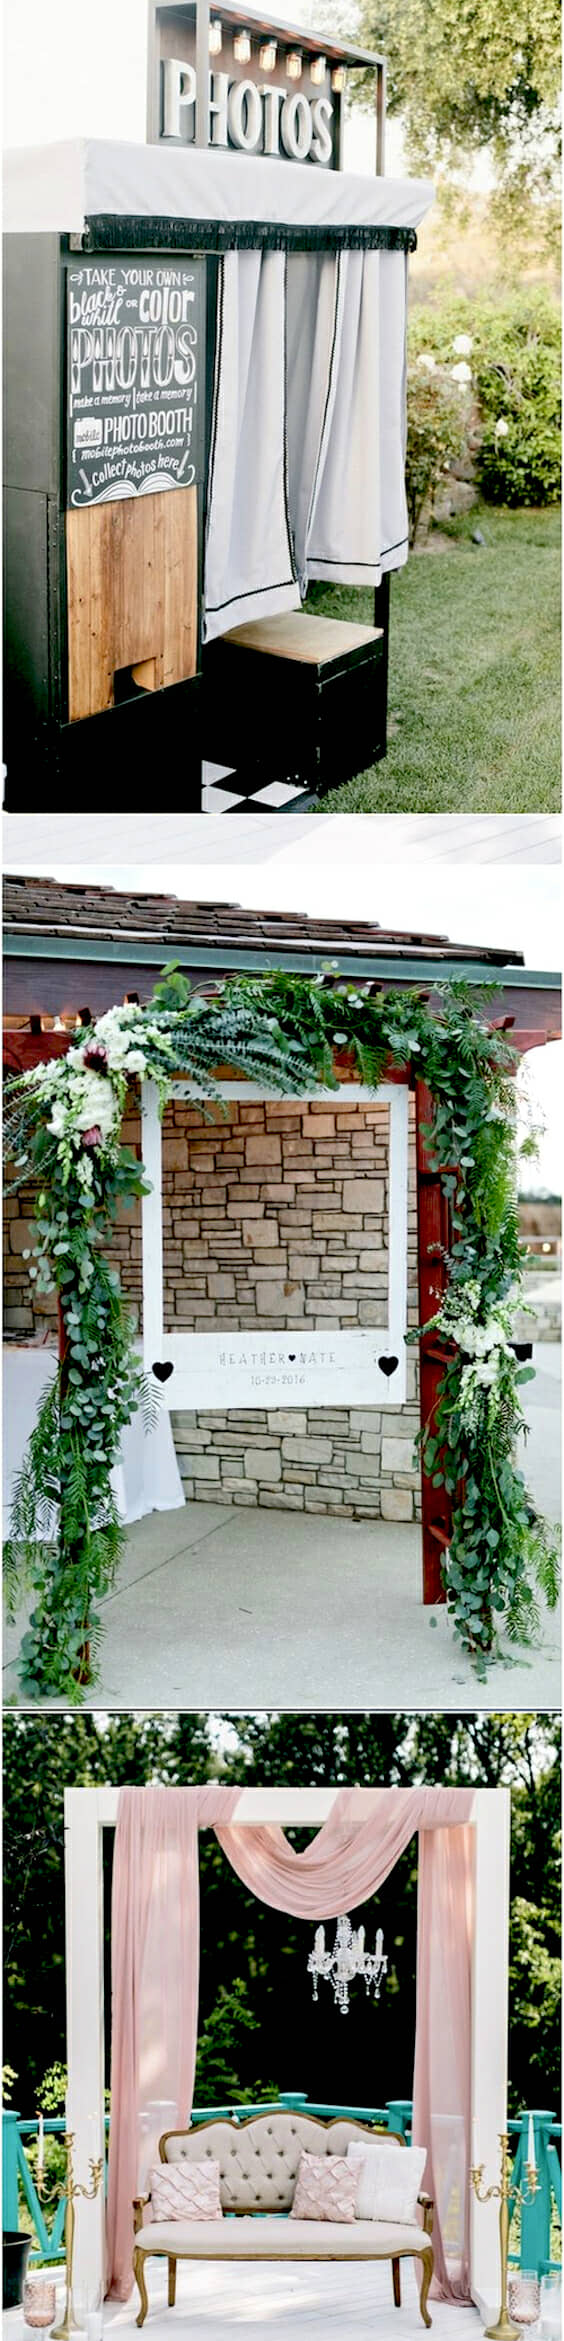 Unique wedding photo booth ideas.